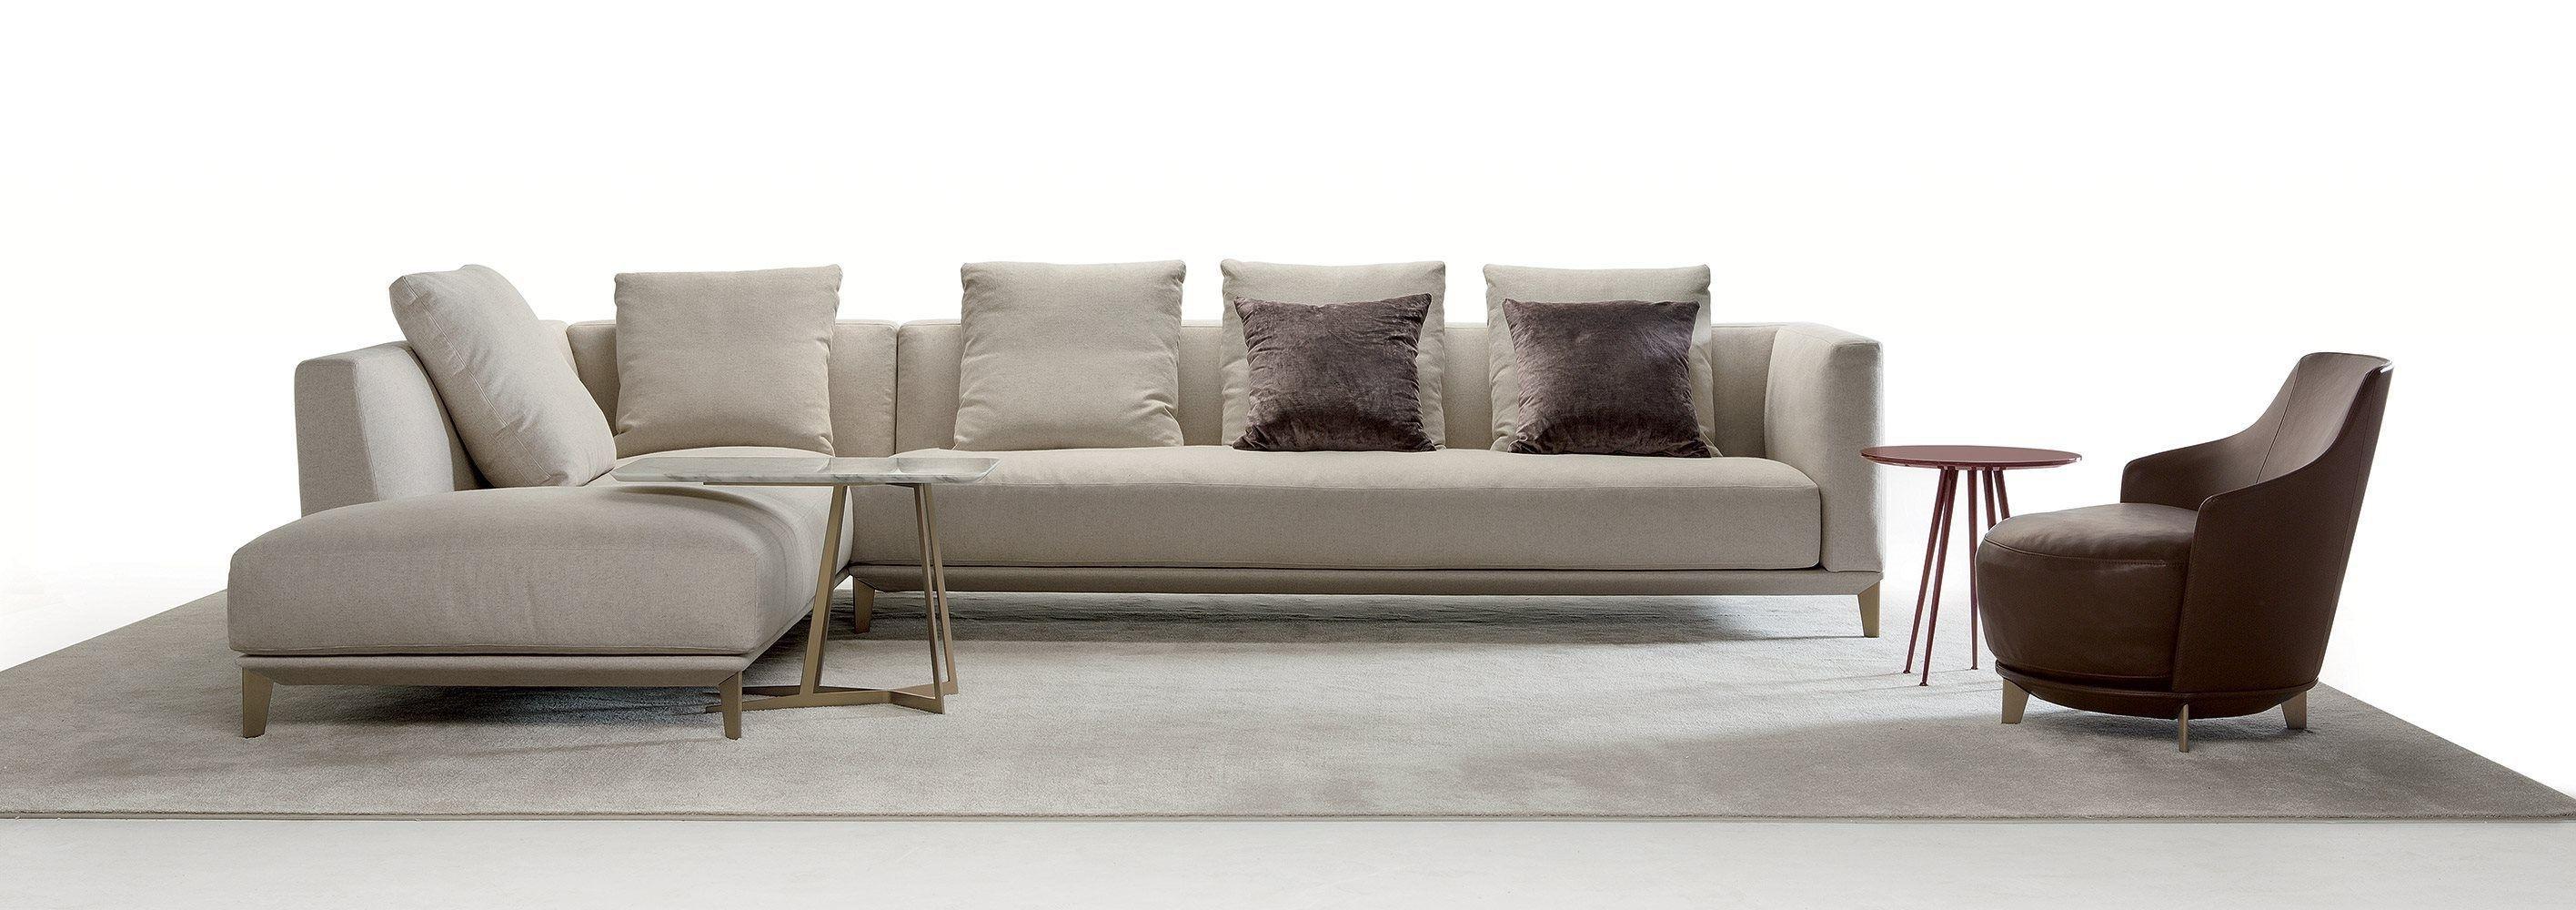 Corner Sofa / Modular / Contemporary / Fabric – Dylancastello Regarding 2017 Contemporary Fabric Sofas (View 4 of 15)